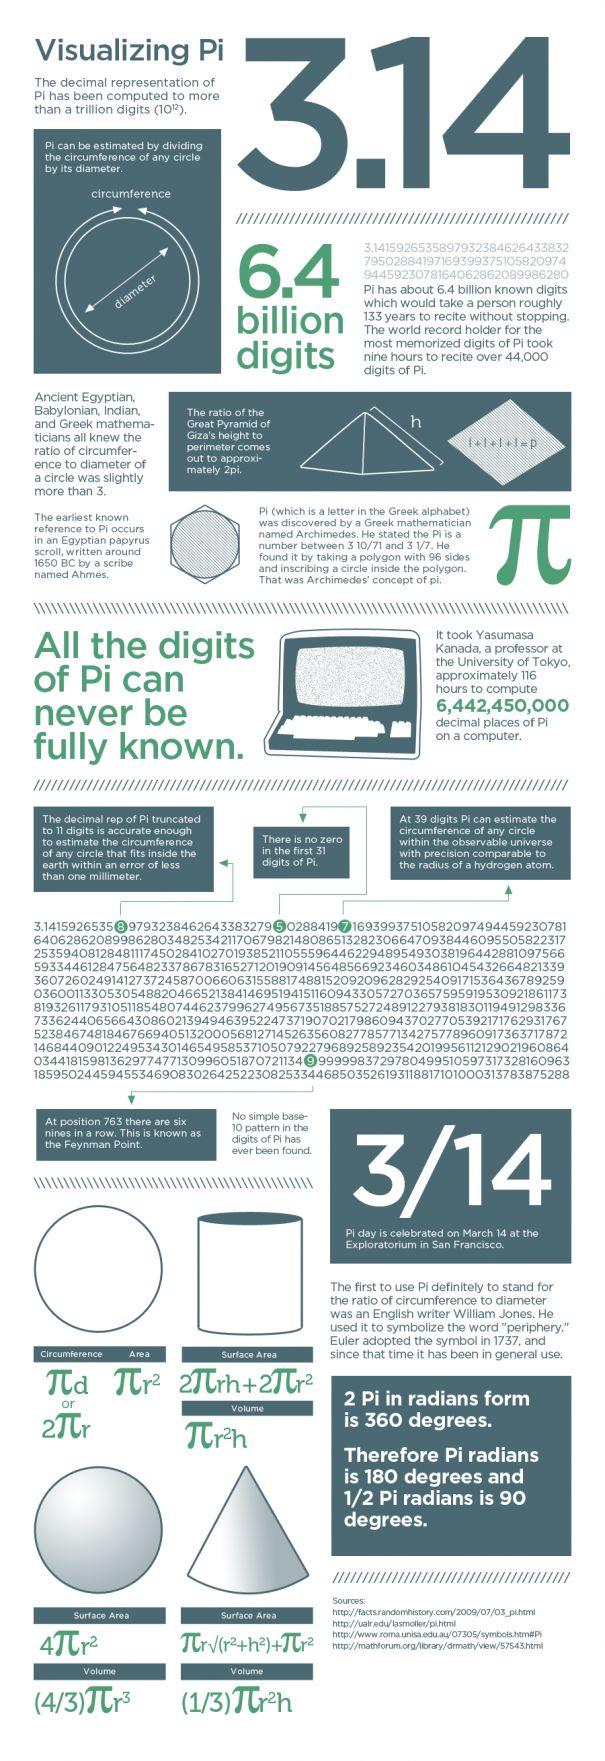 Pi Day 2013: Pi Trivia, Pi Videos, Pi Songs & A Pi Infographic – ReadWrite